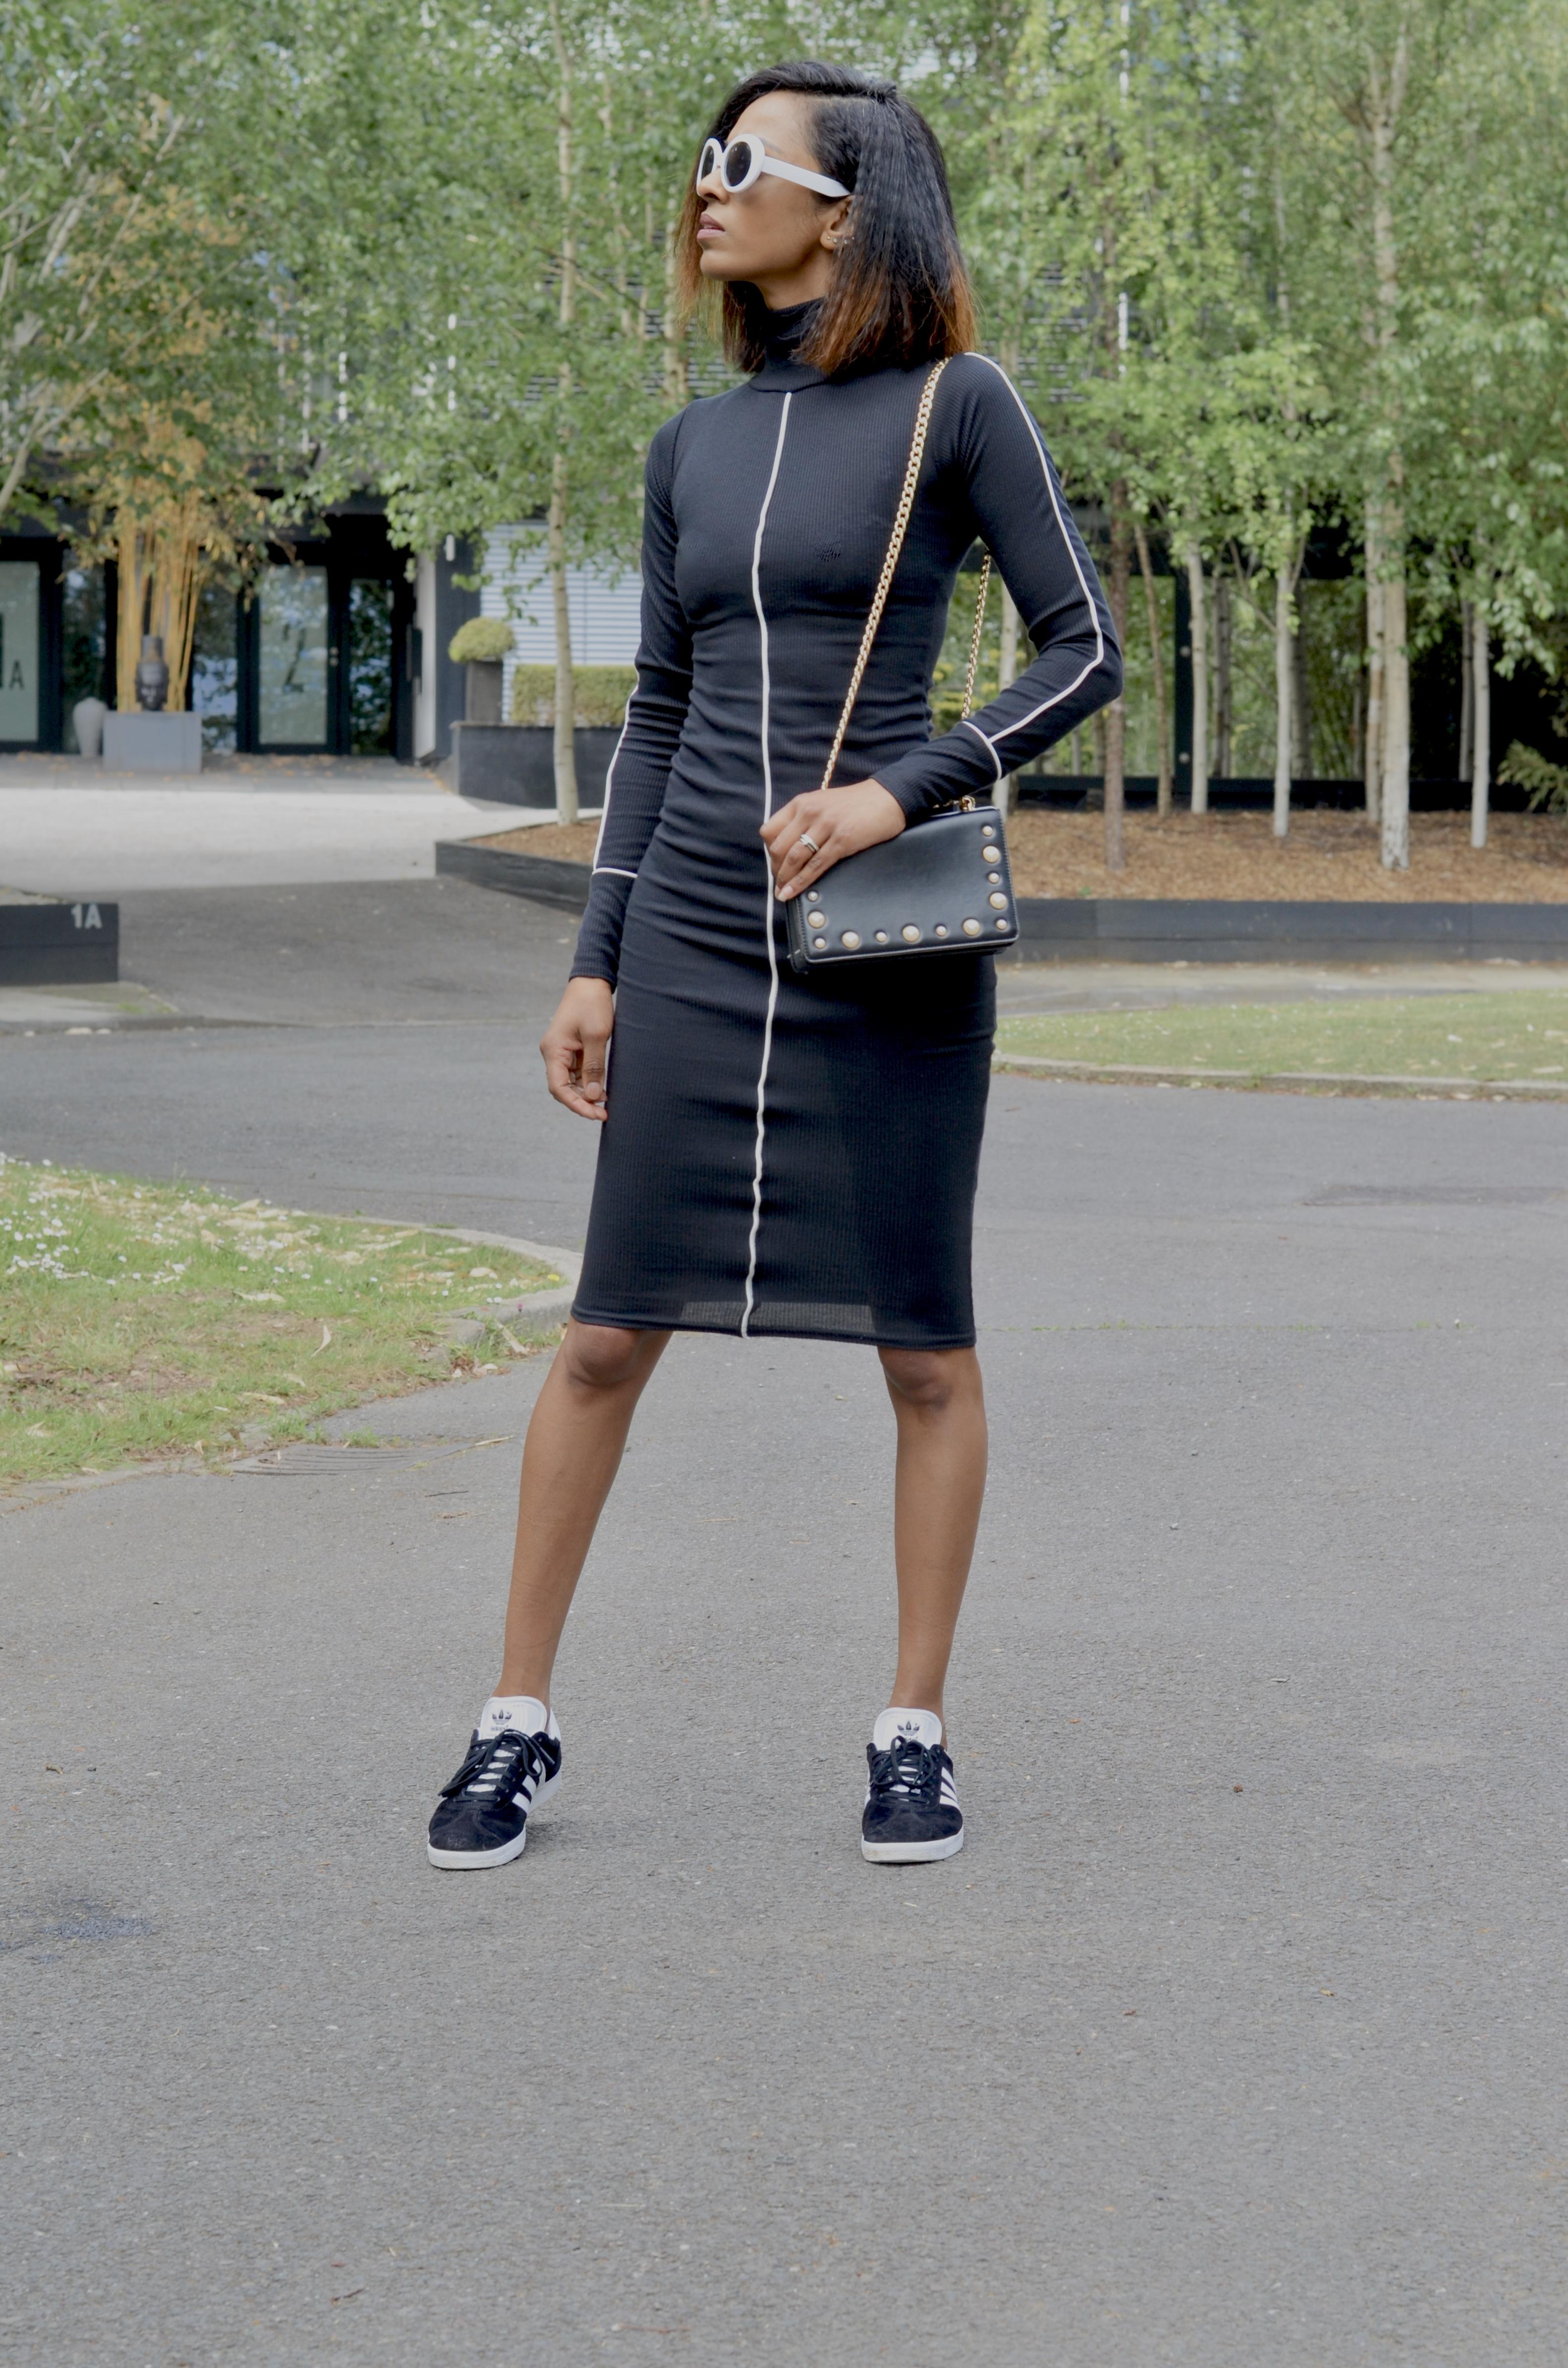 adidas gazelle femme look